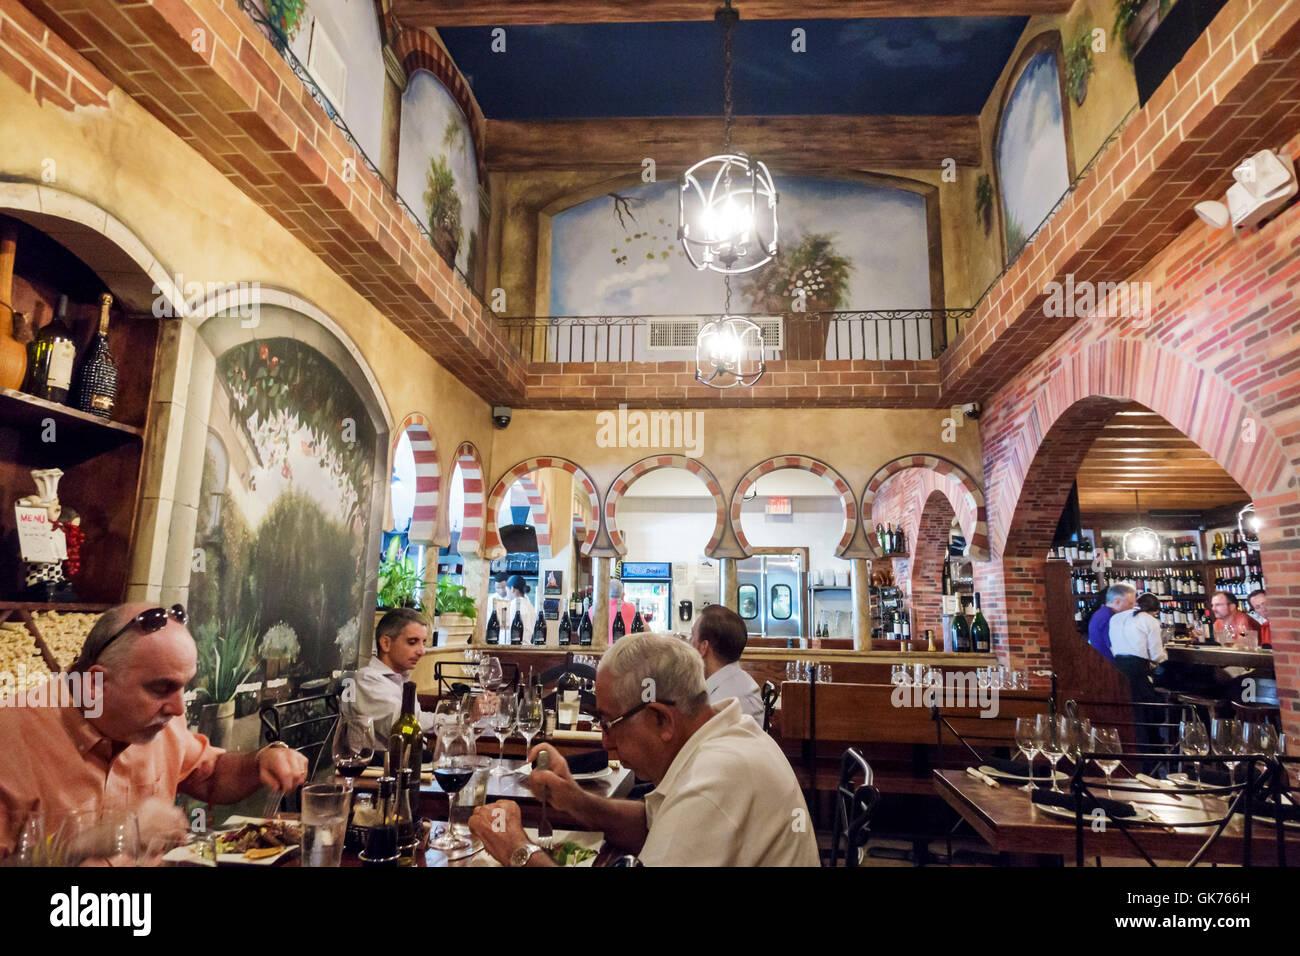 Sala Da Pranzo Etnica.Miami Florida El Carajo Tapas Bar Di Vino Spagnolo